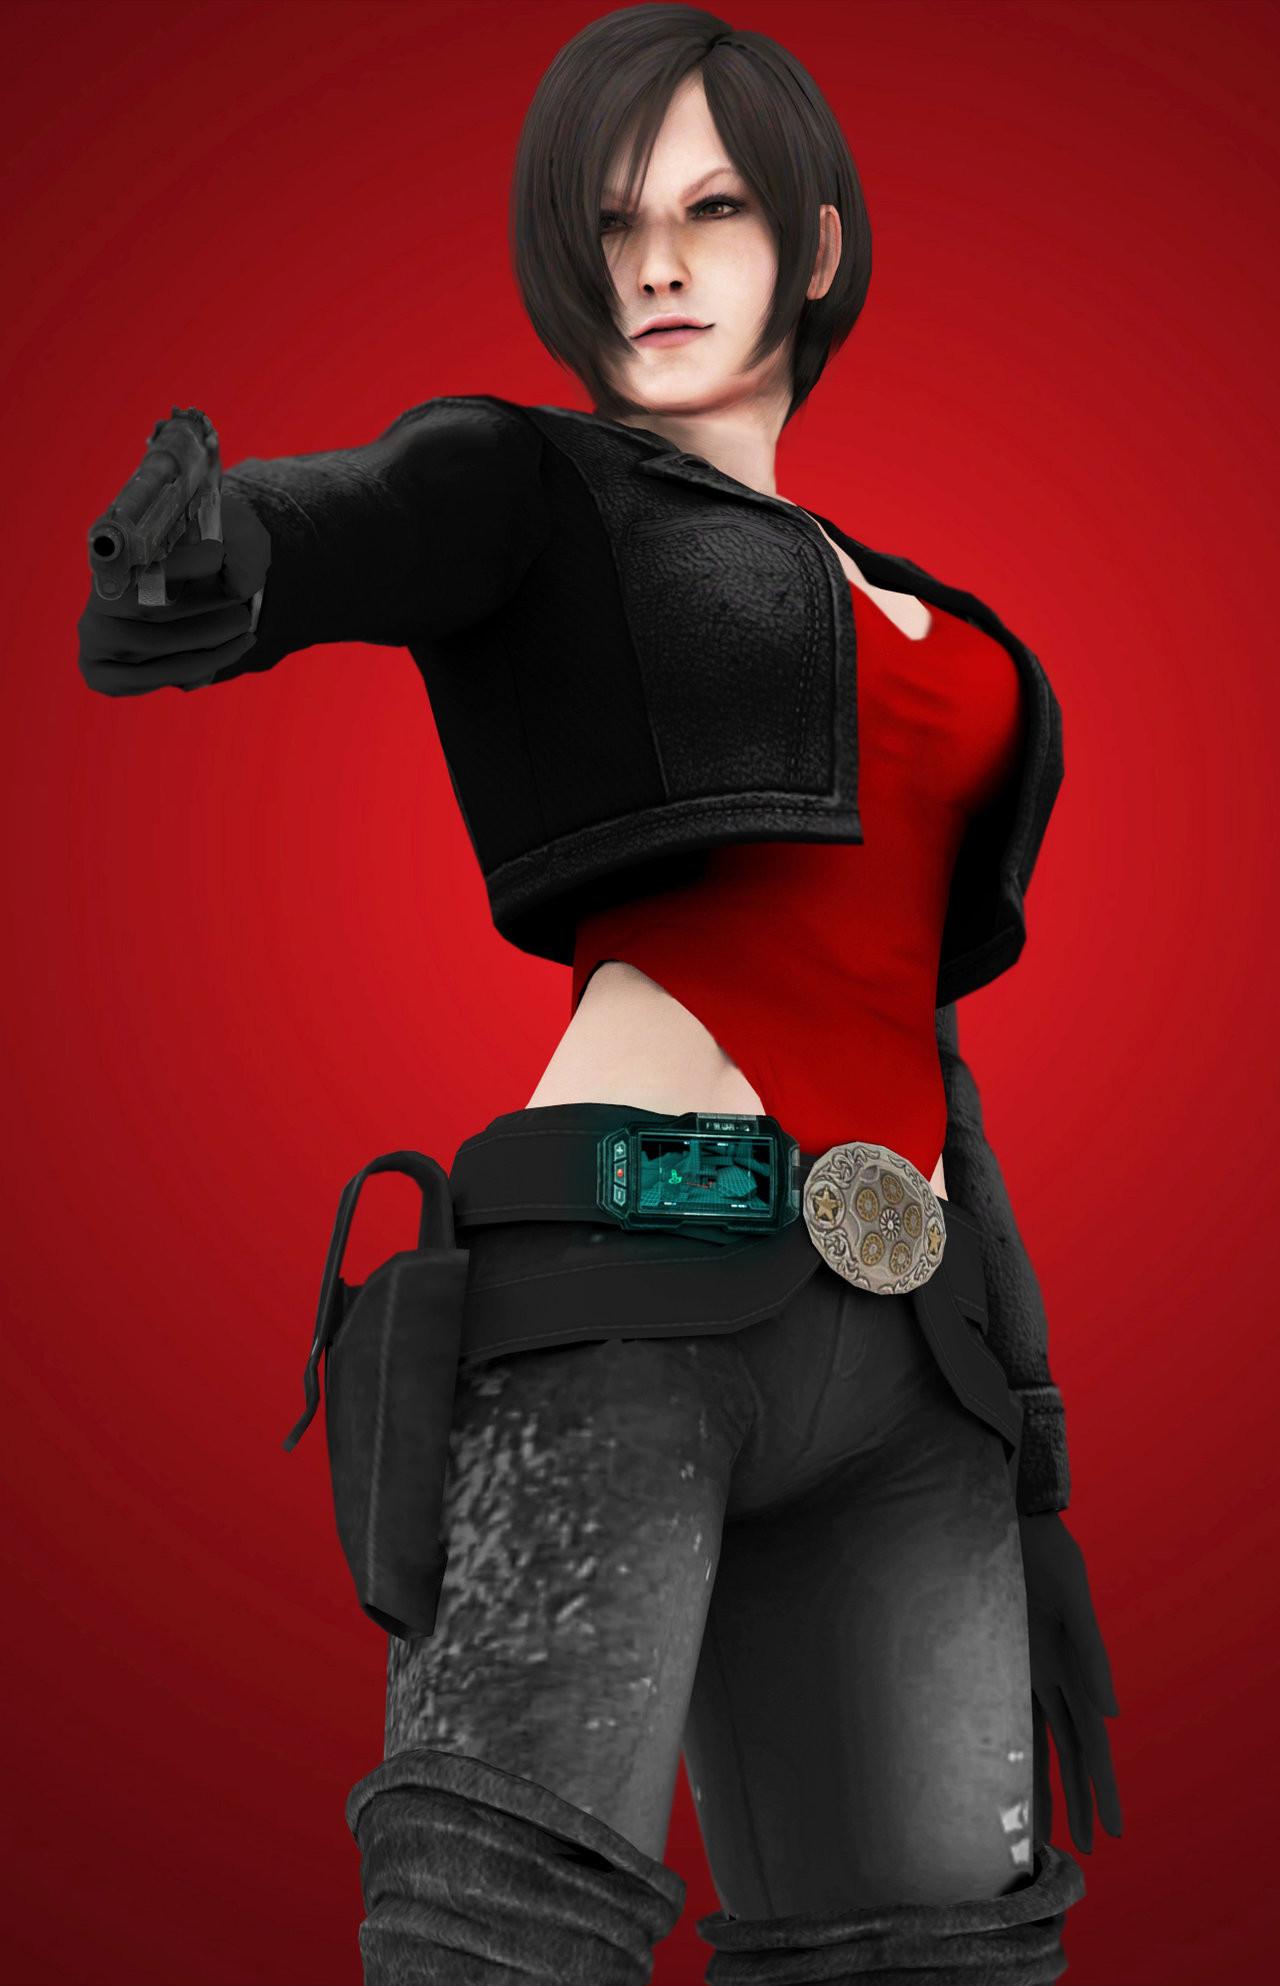 1242x2688 Ada Wong Resident Evil 2 4k Iphone XS MAX HD 4k